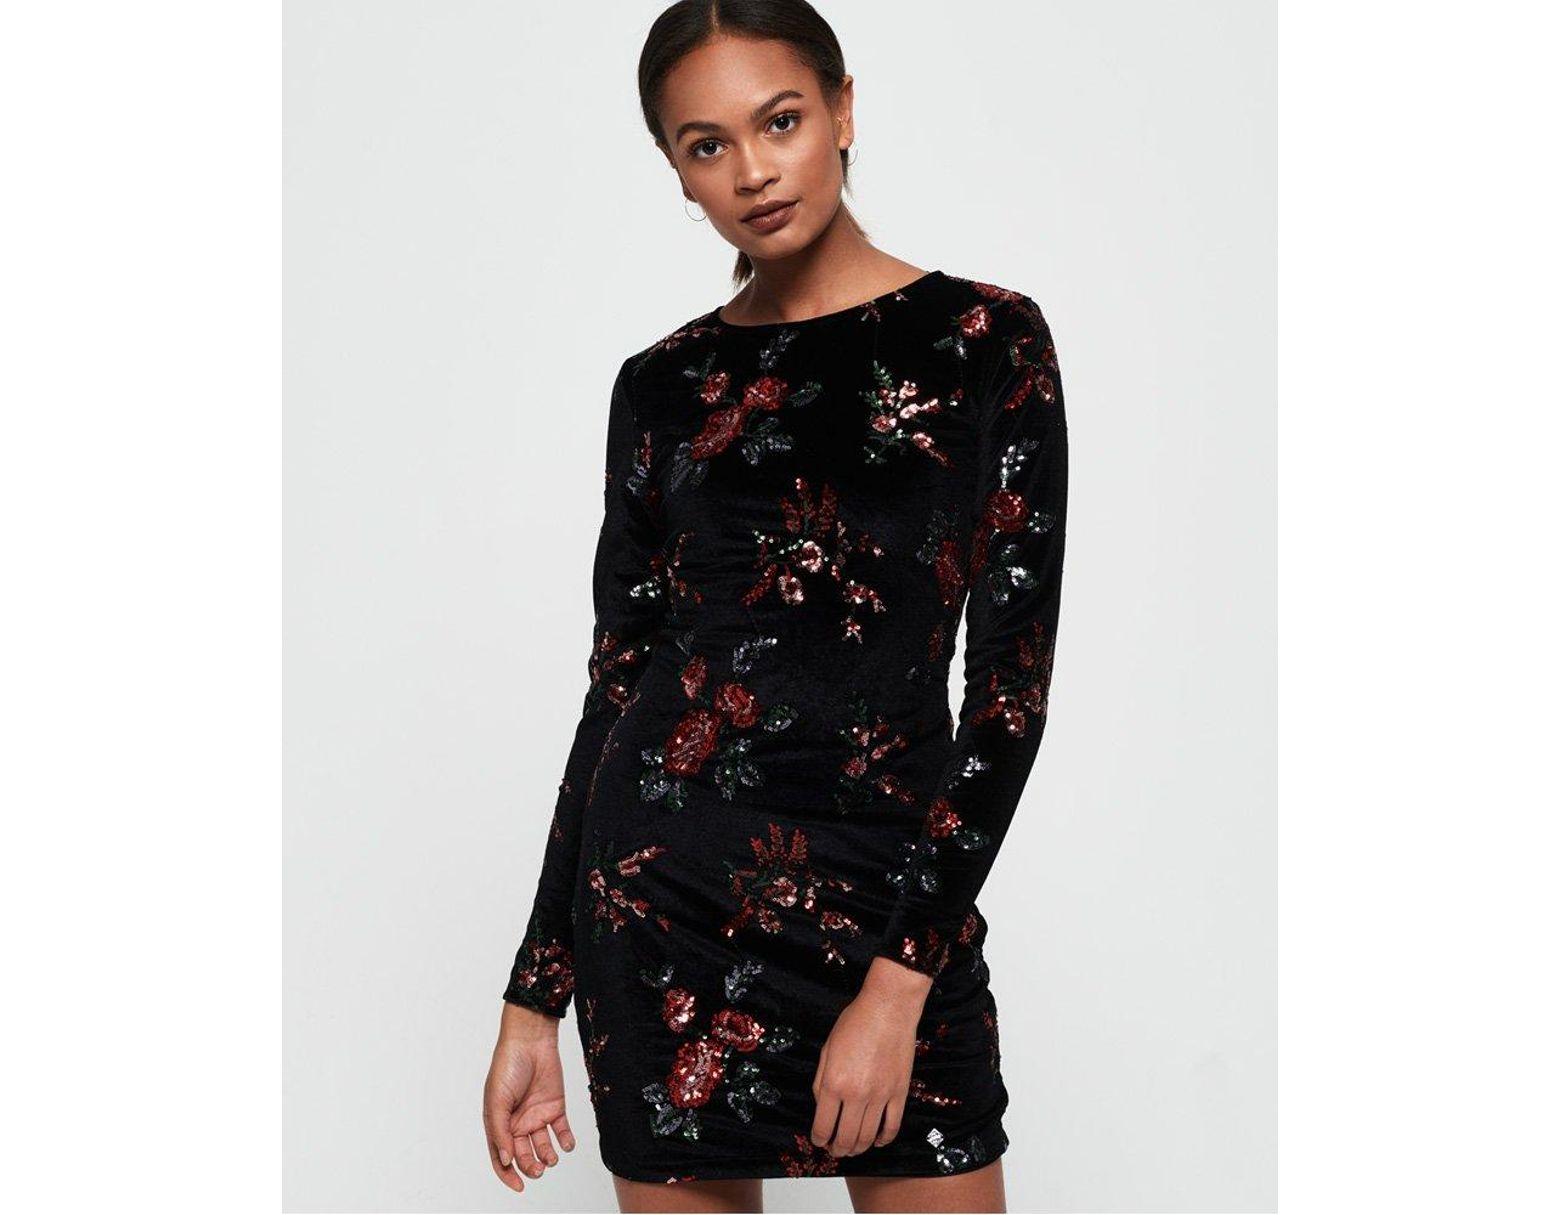 54509152a1 Superdry Melrose Sequin Velvet Dress in Black - Lyst